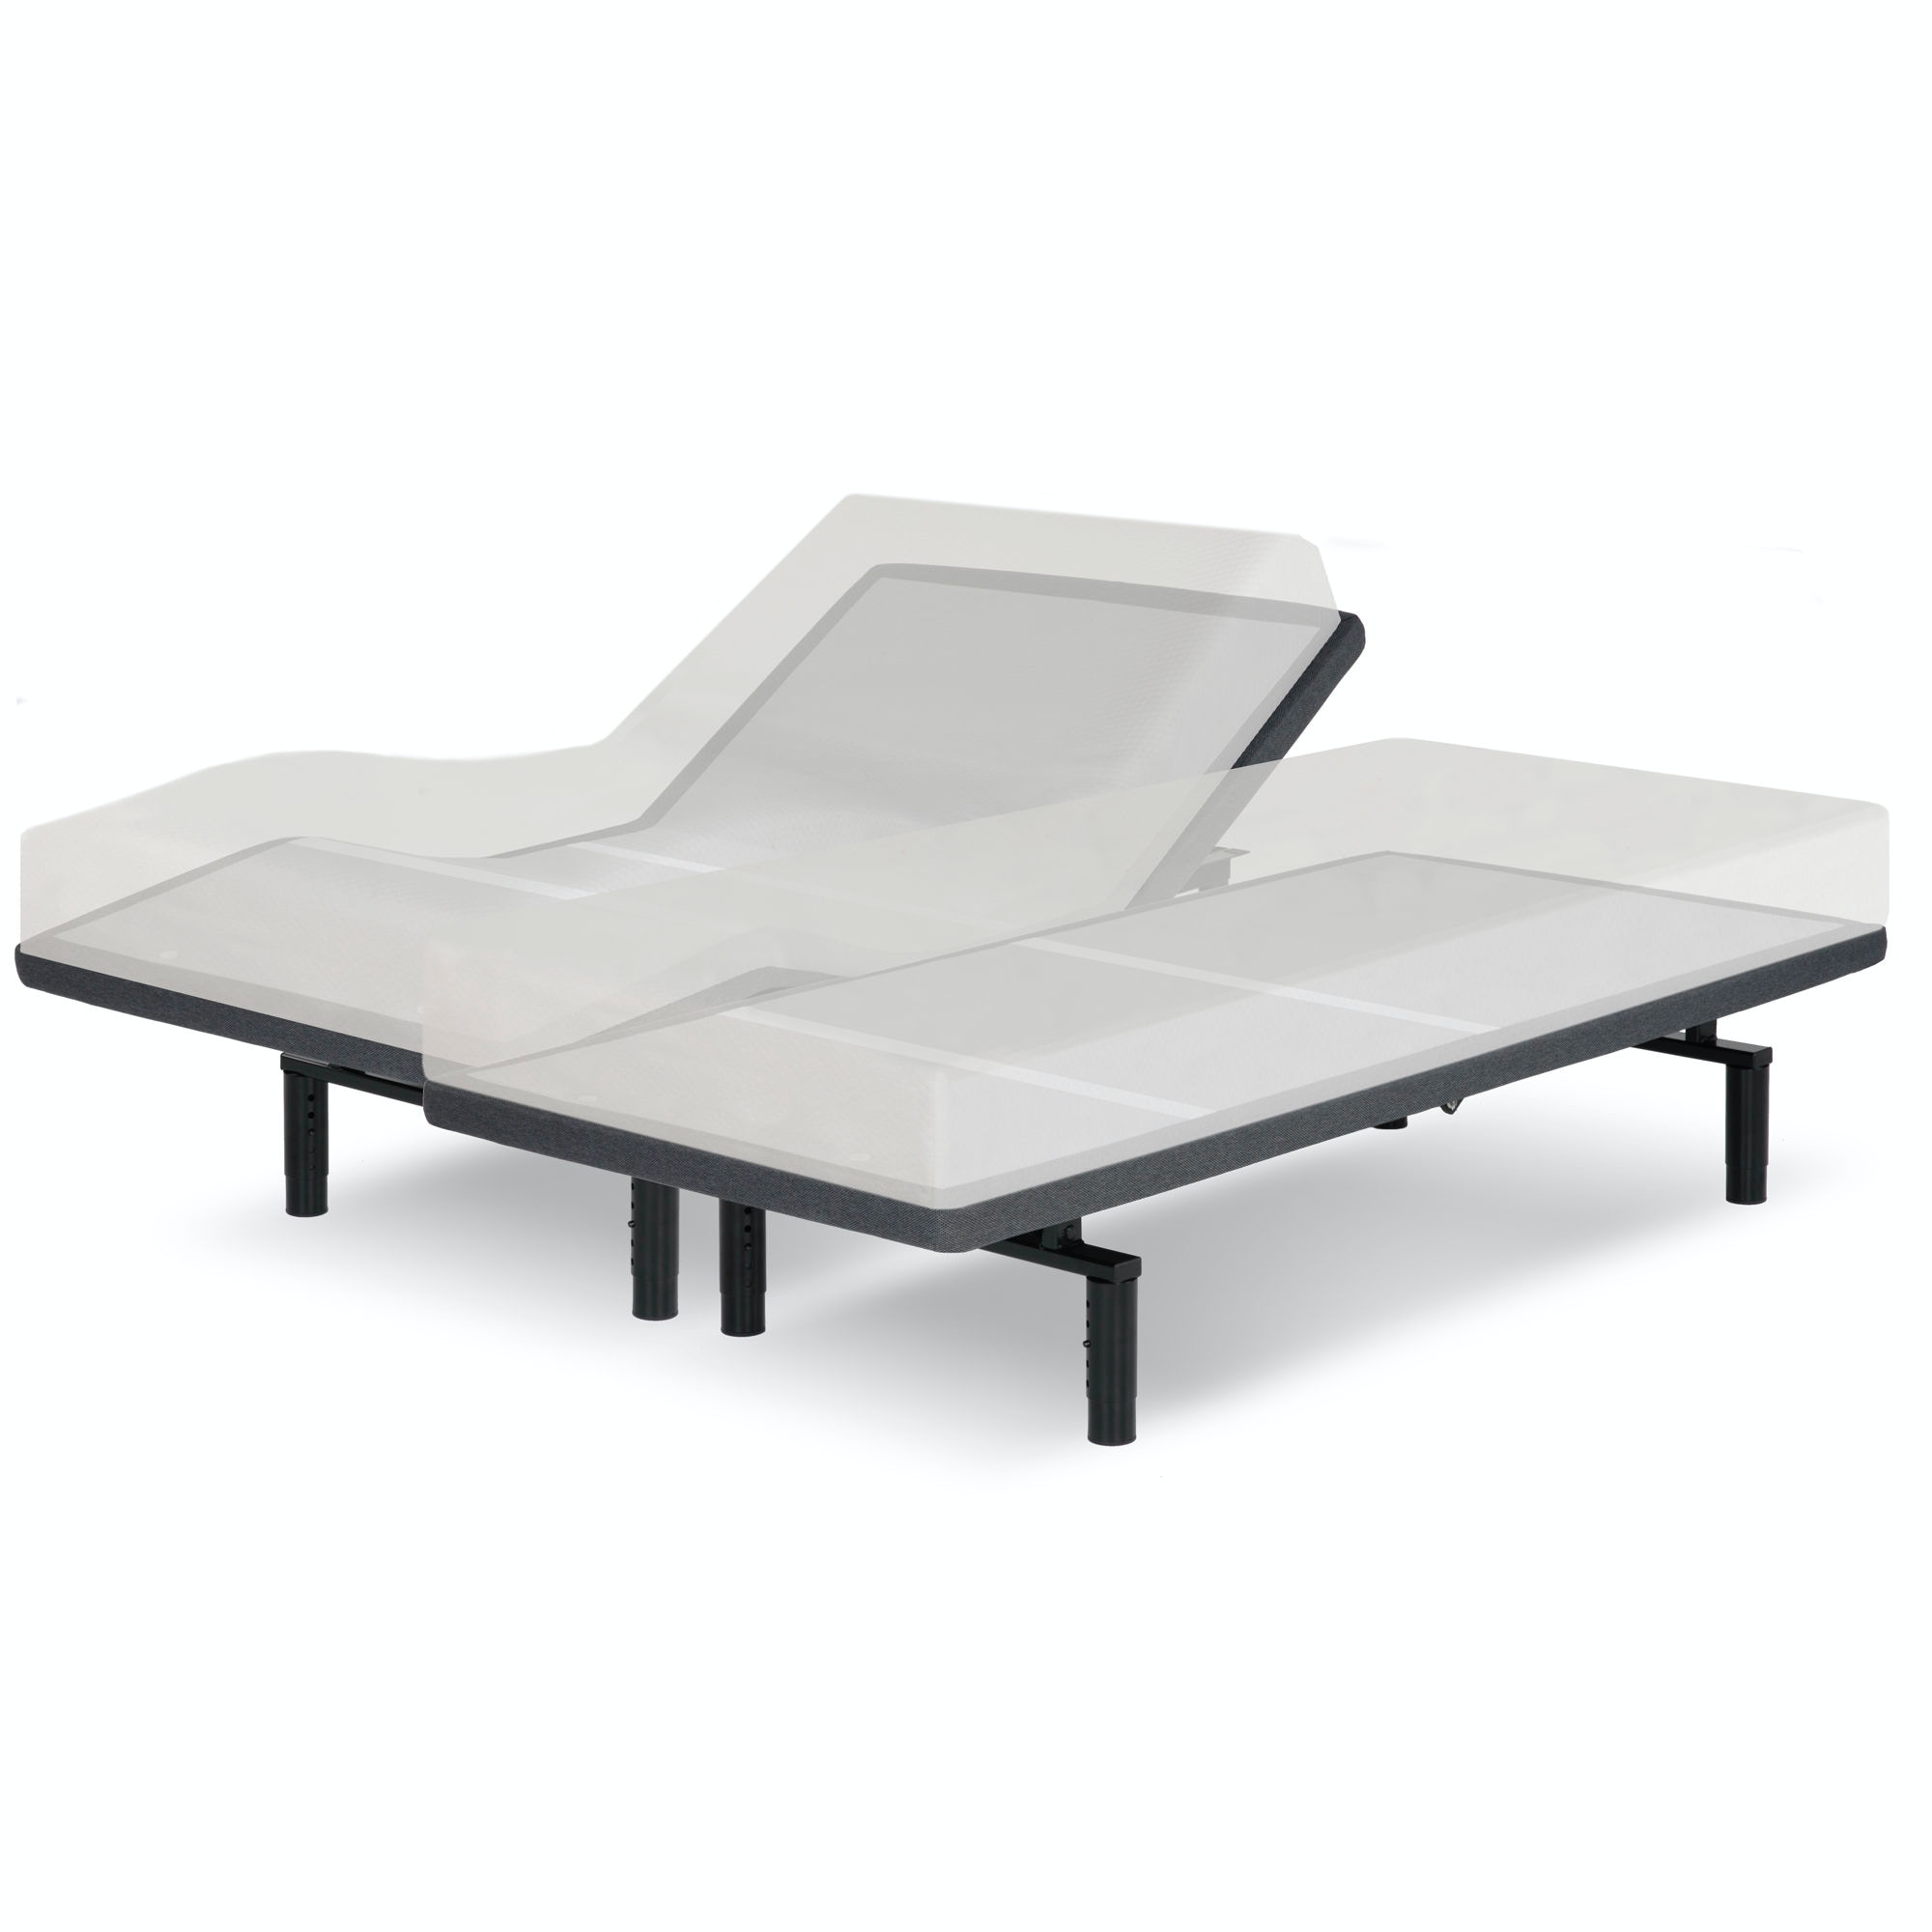 Leggett /& Platt Falcon 2.0 Split California King Adjustable Bed Base